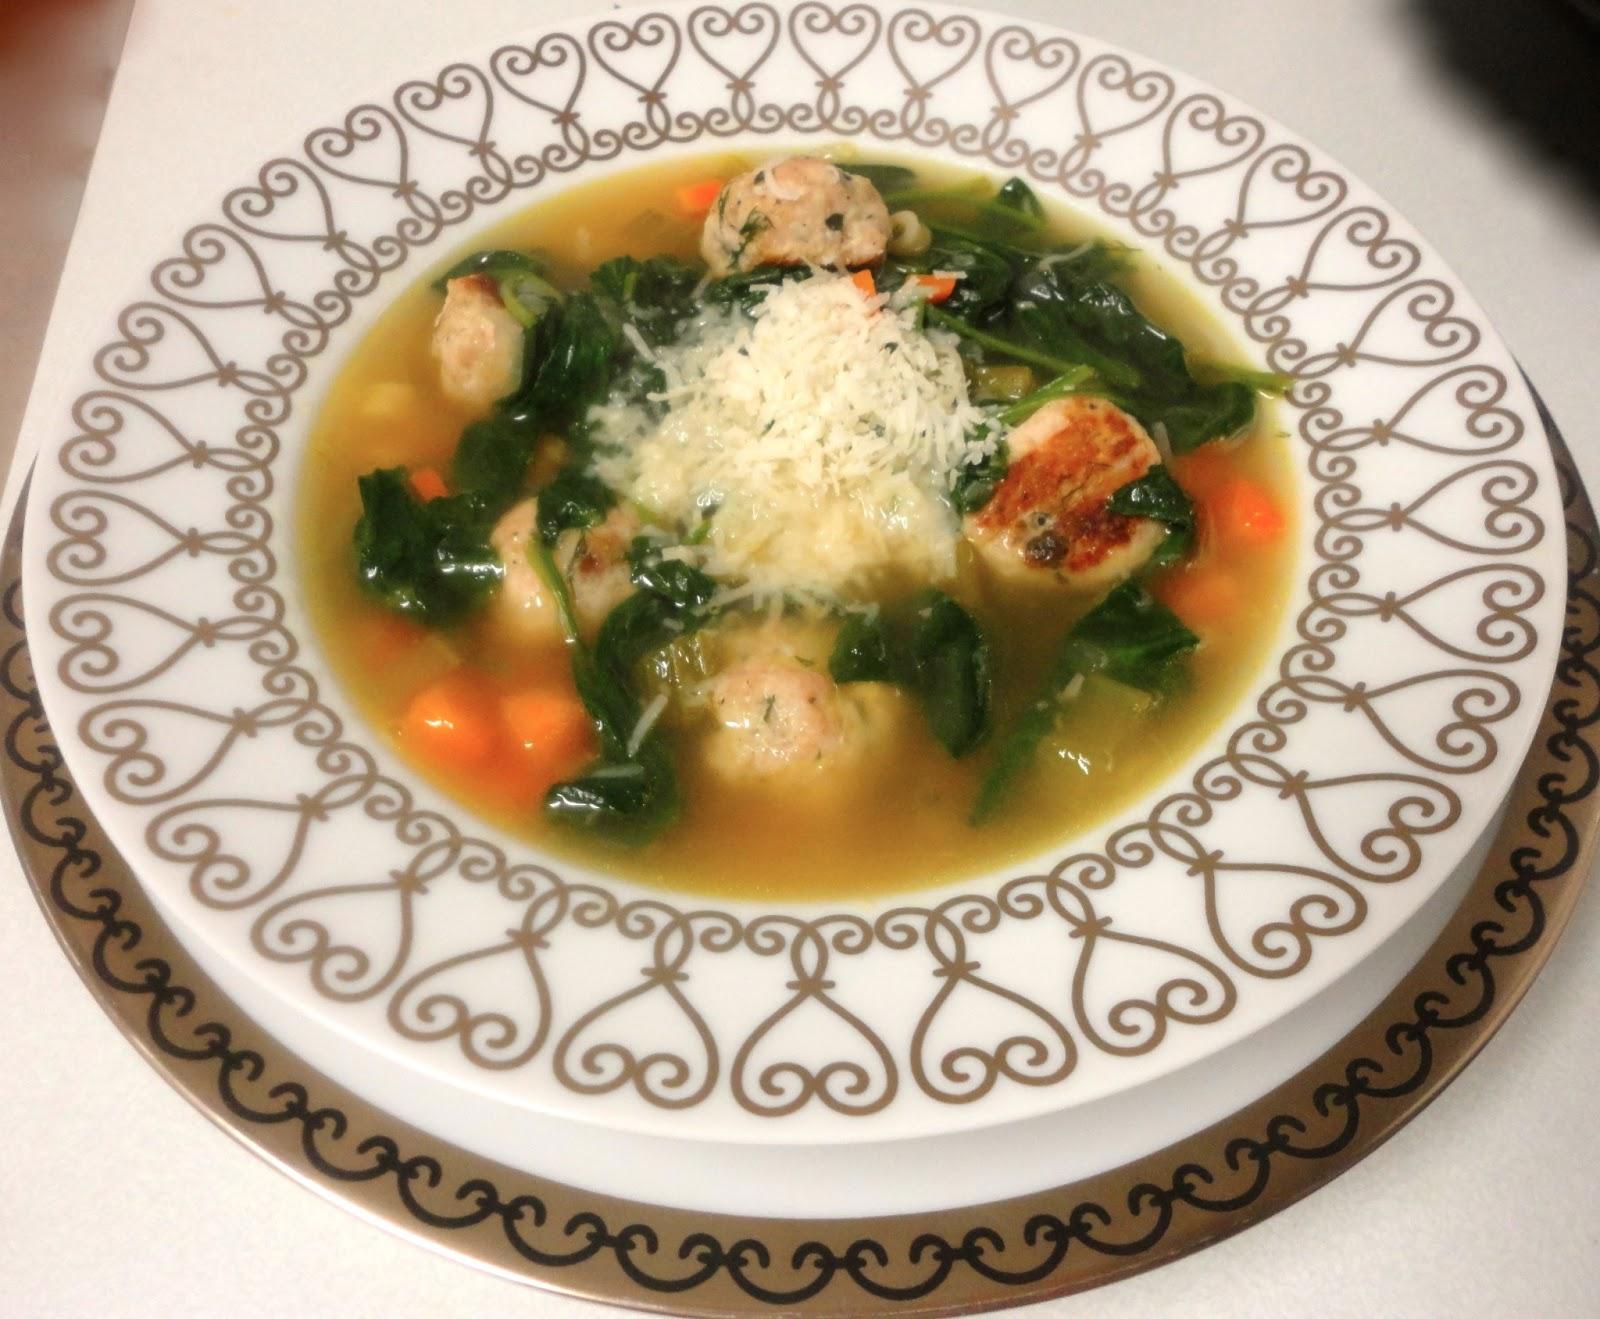 Ina Garten S Italian Wedding Soup And Her Recipe For En Stock C H E W I N G T F A